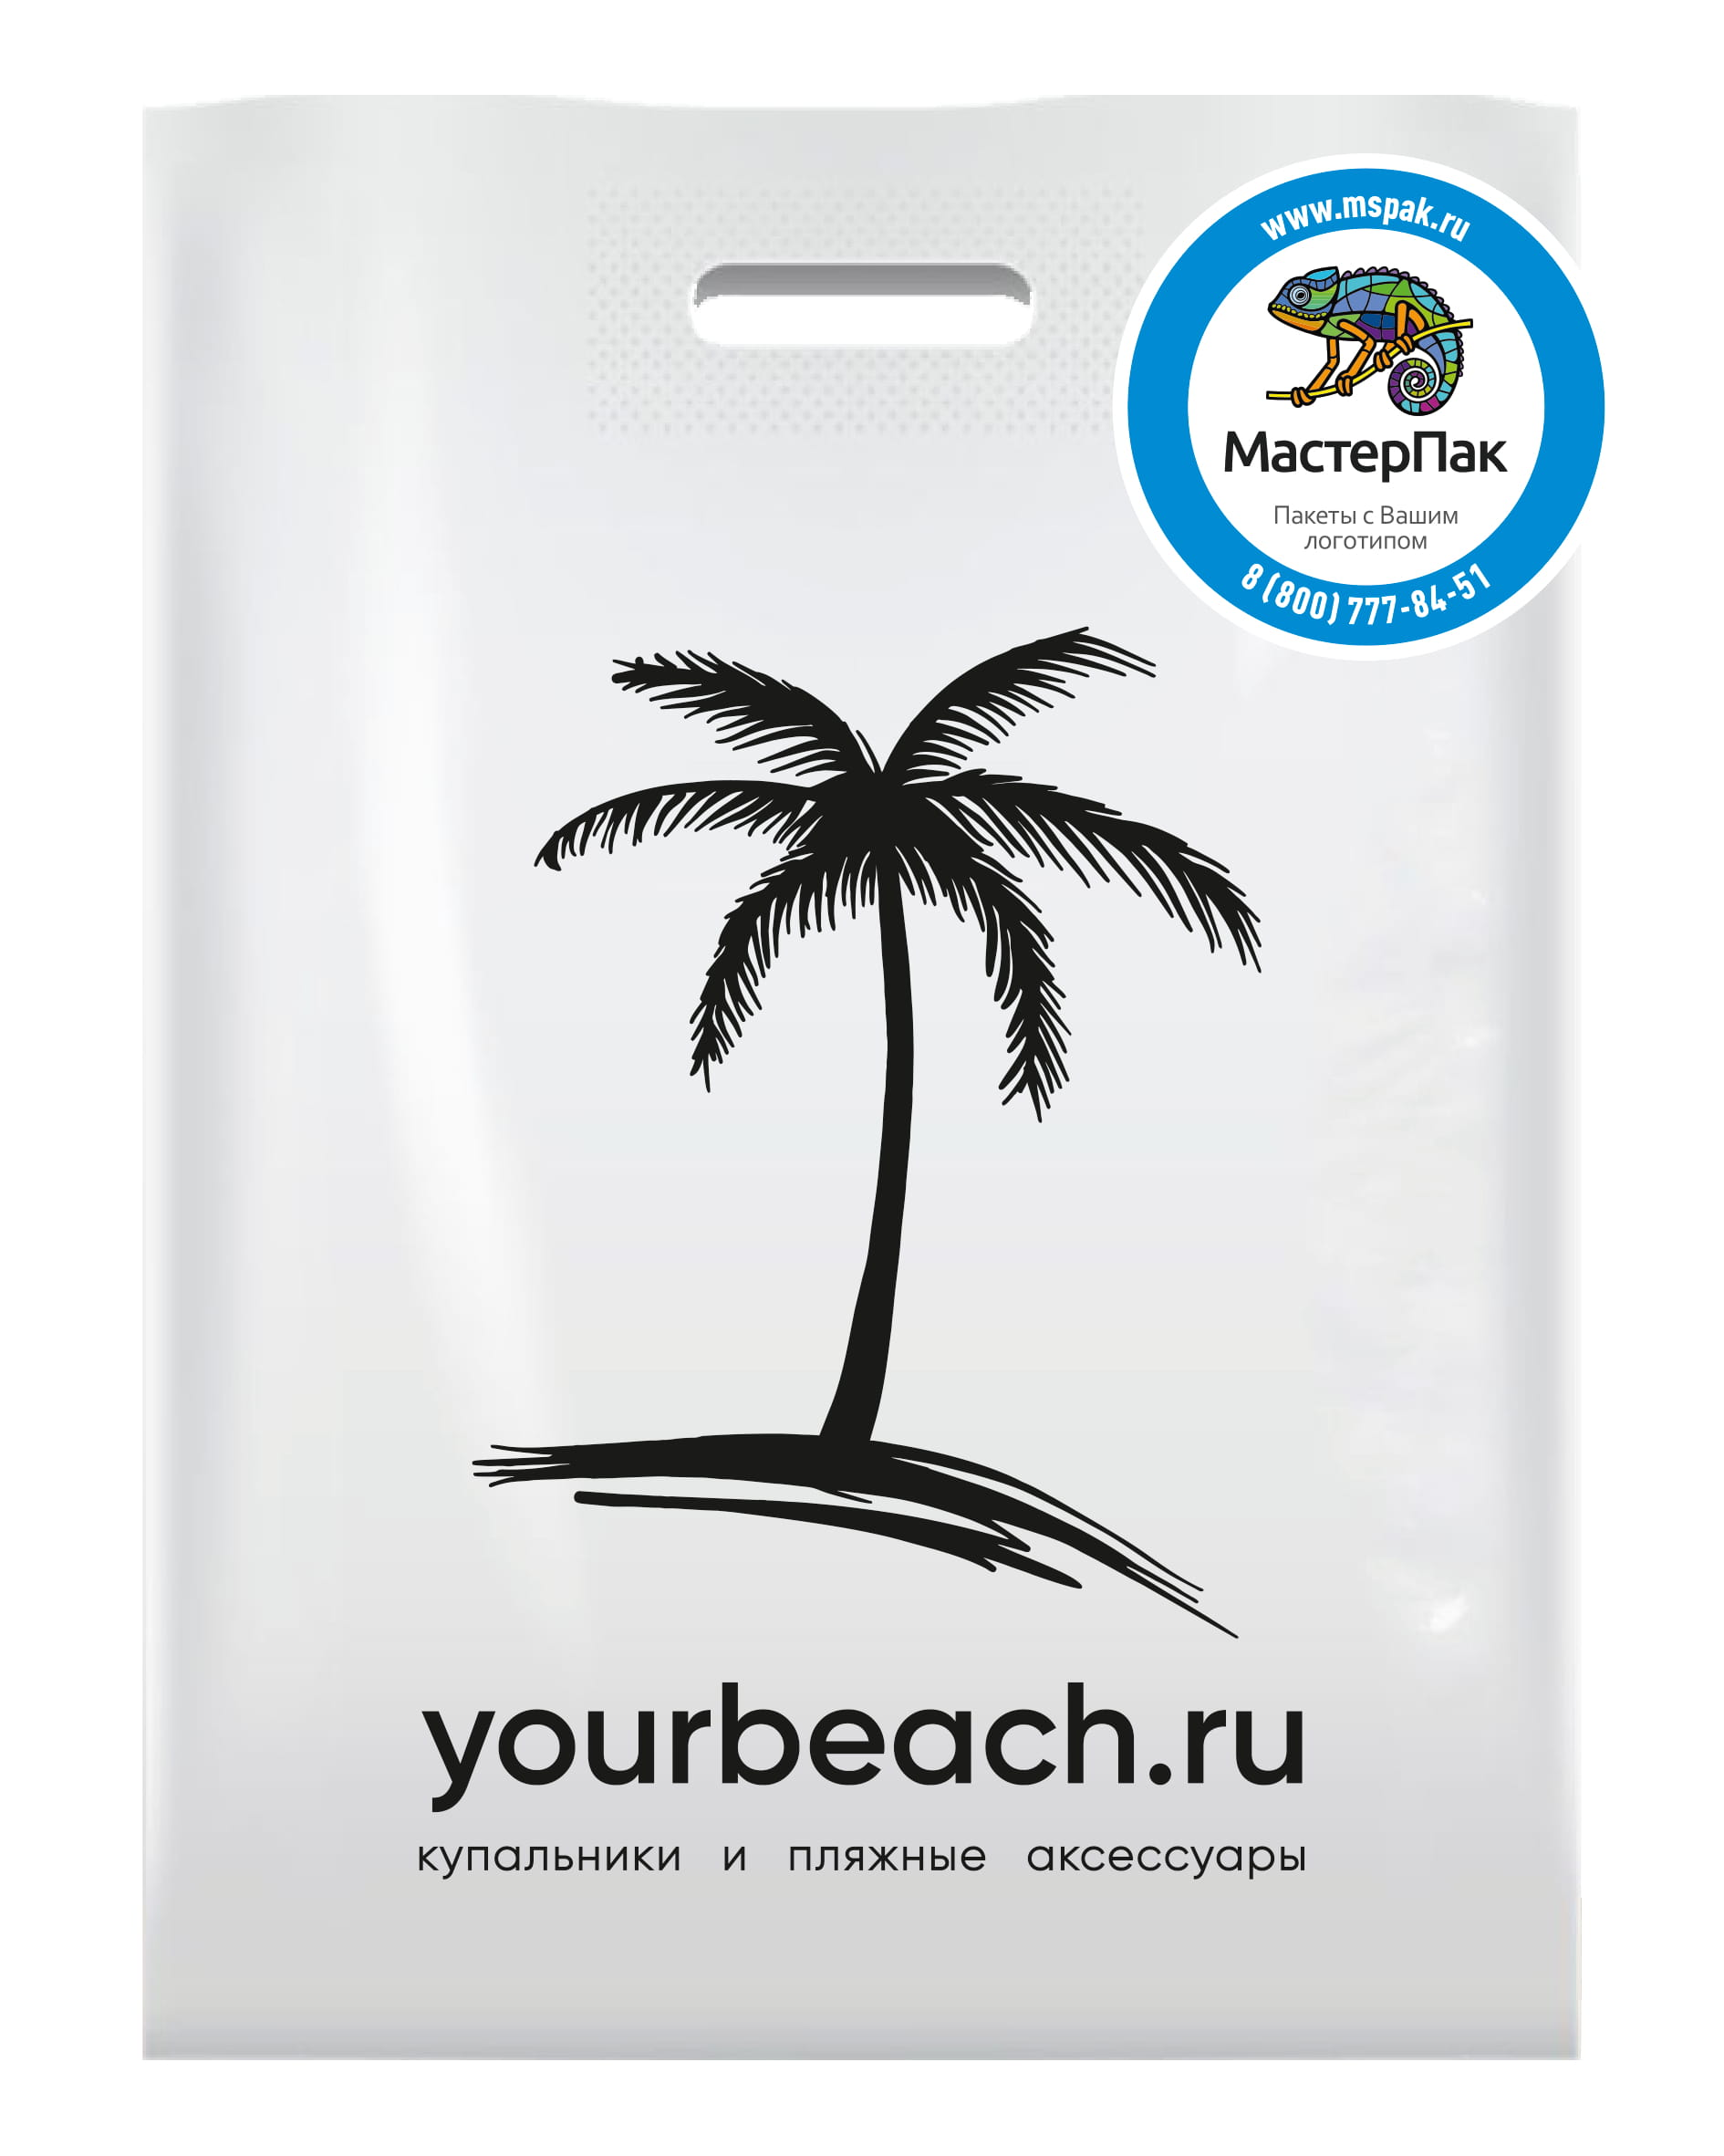 Пакет ПВД с логотипом магазина Yourbeach.ru, Москва, белый